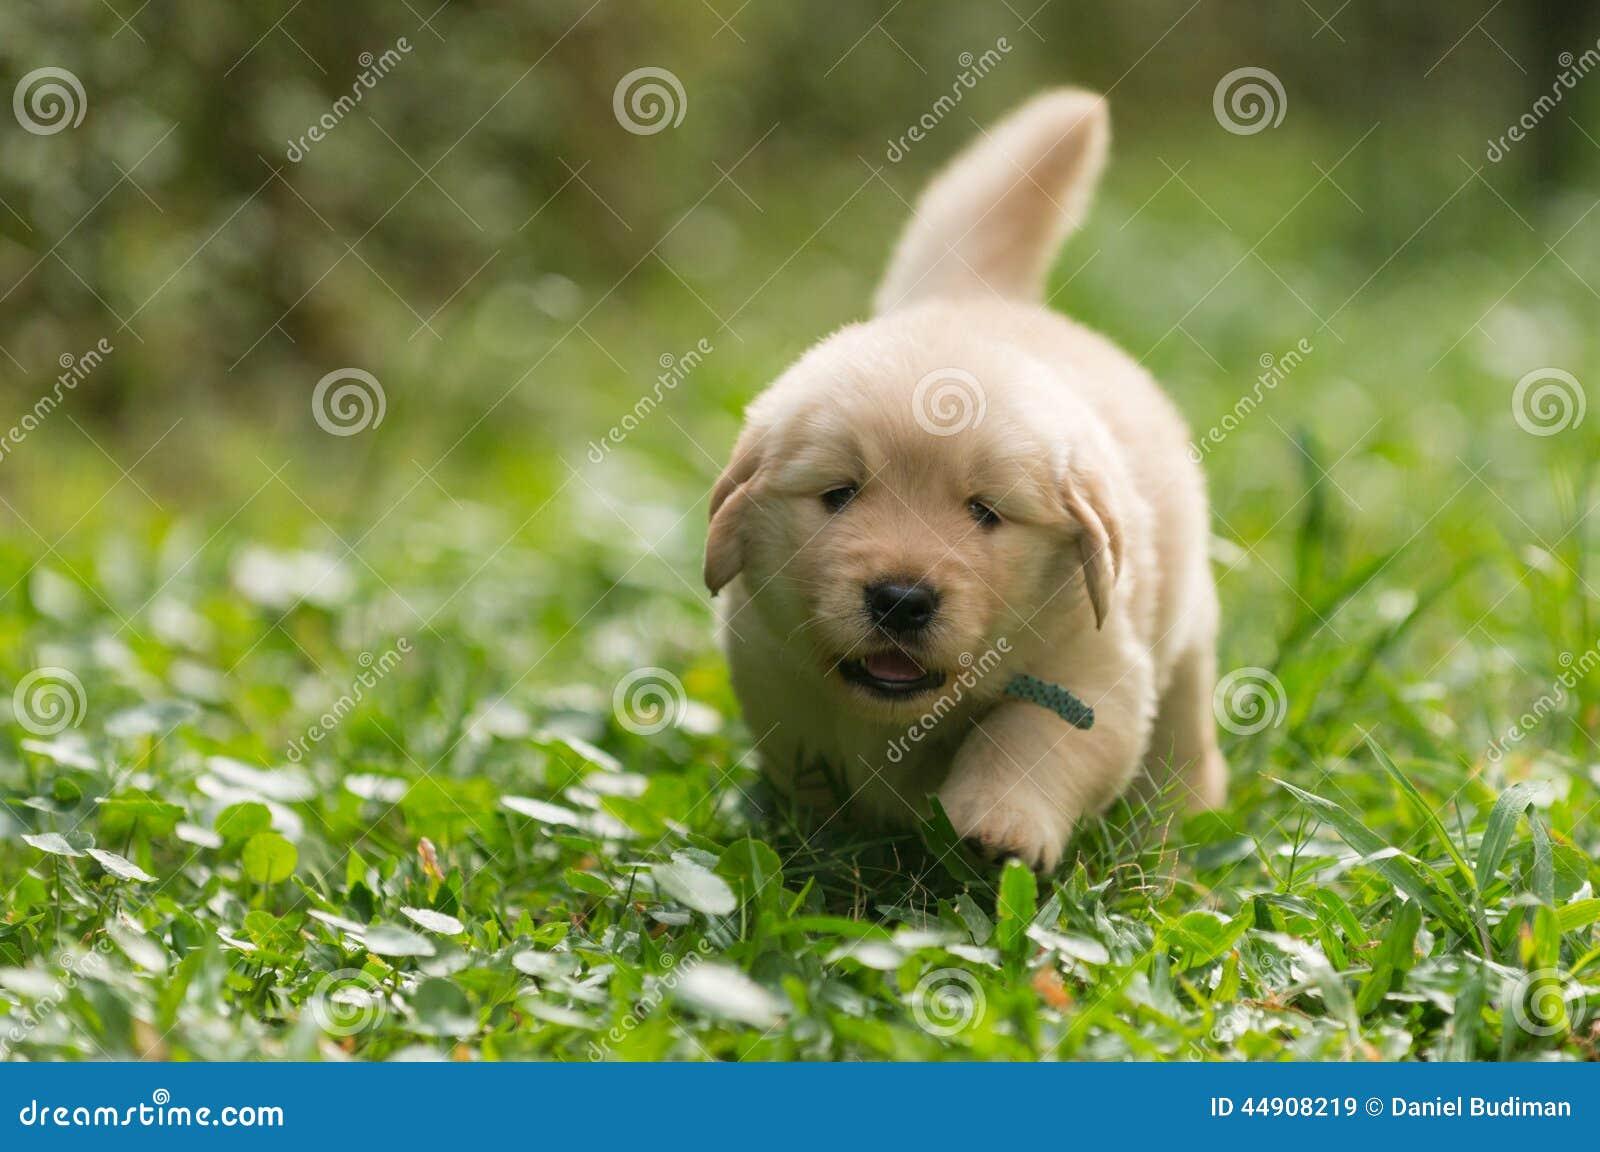 Cute Golden Retriever Puppy Running In The Garden Stock Image